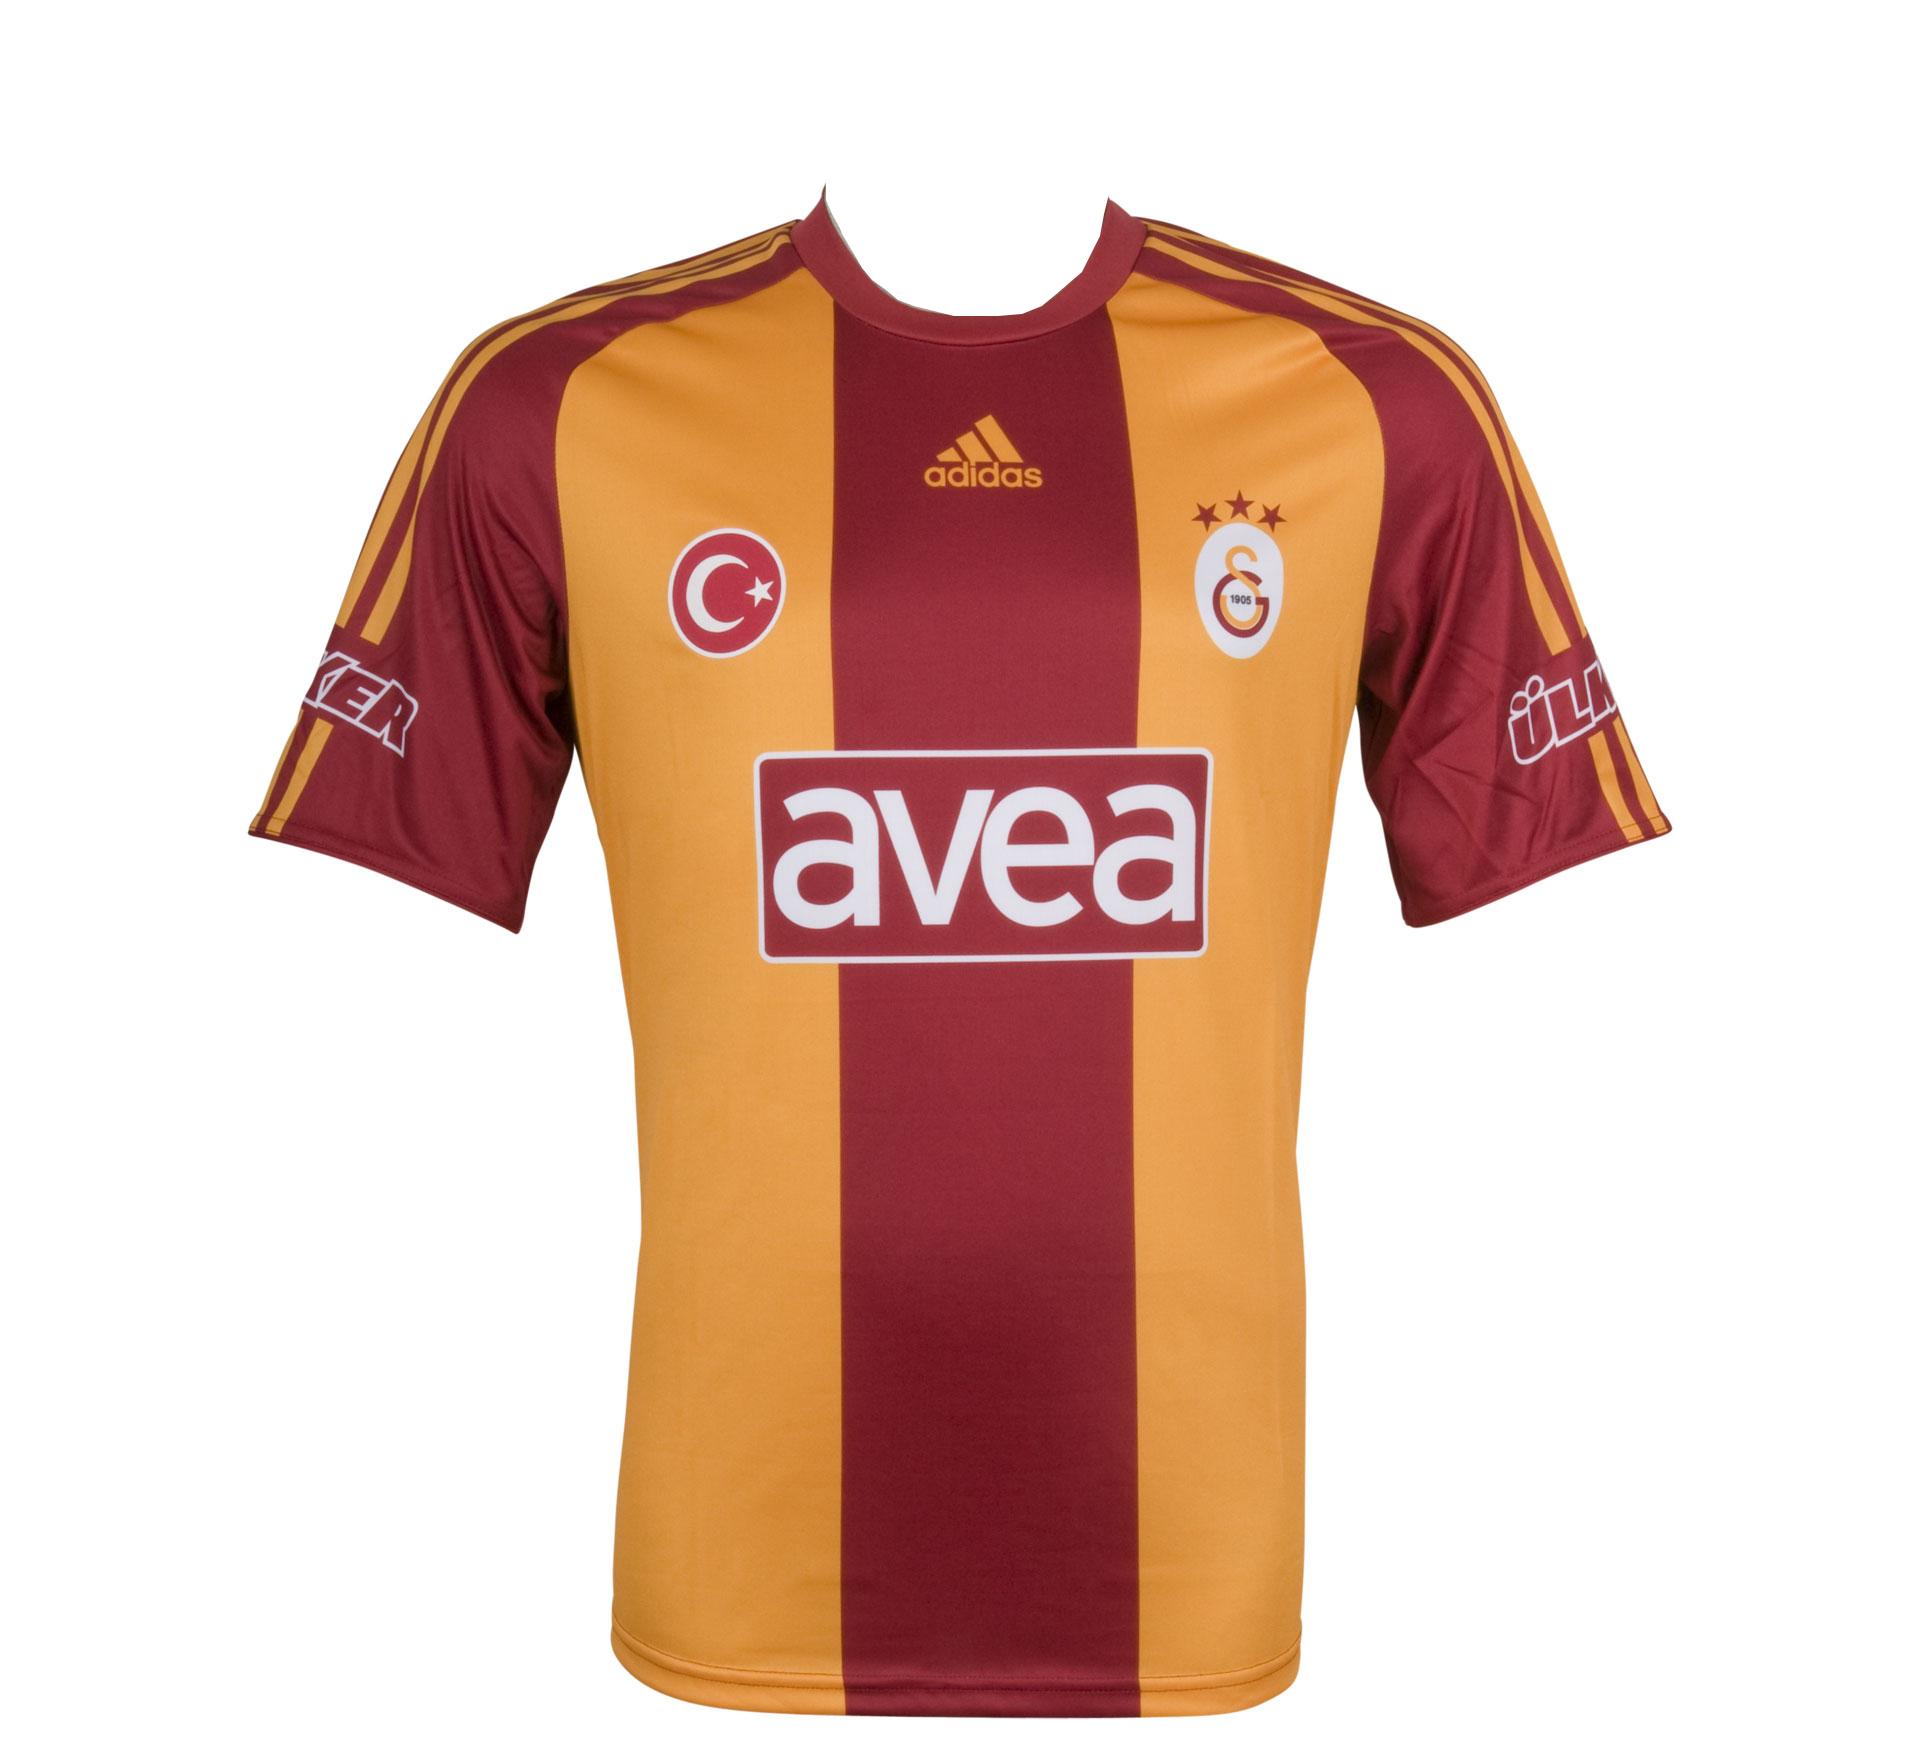 huge discount 2bba2 751b4 2016-2017 Galatasaray 3rd Nike Football Shirt